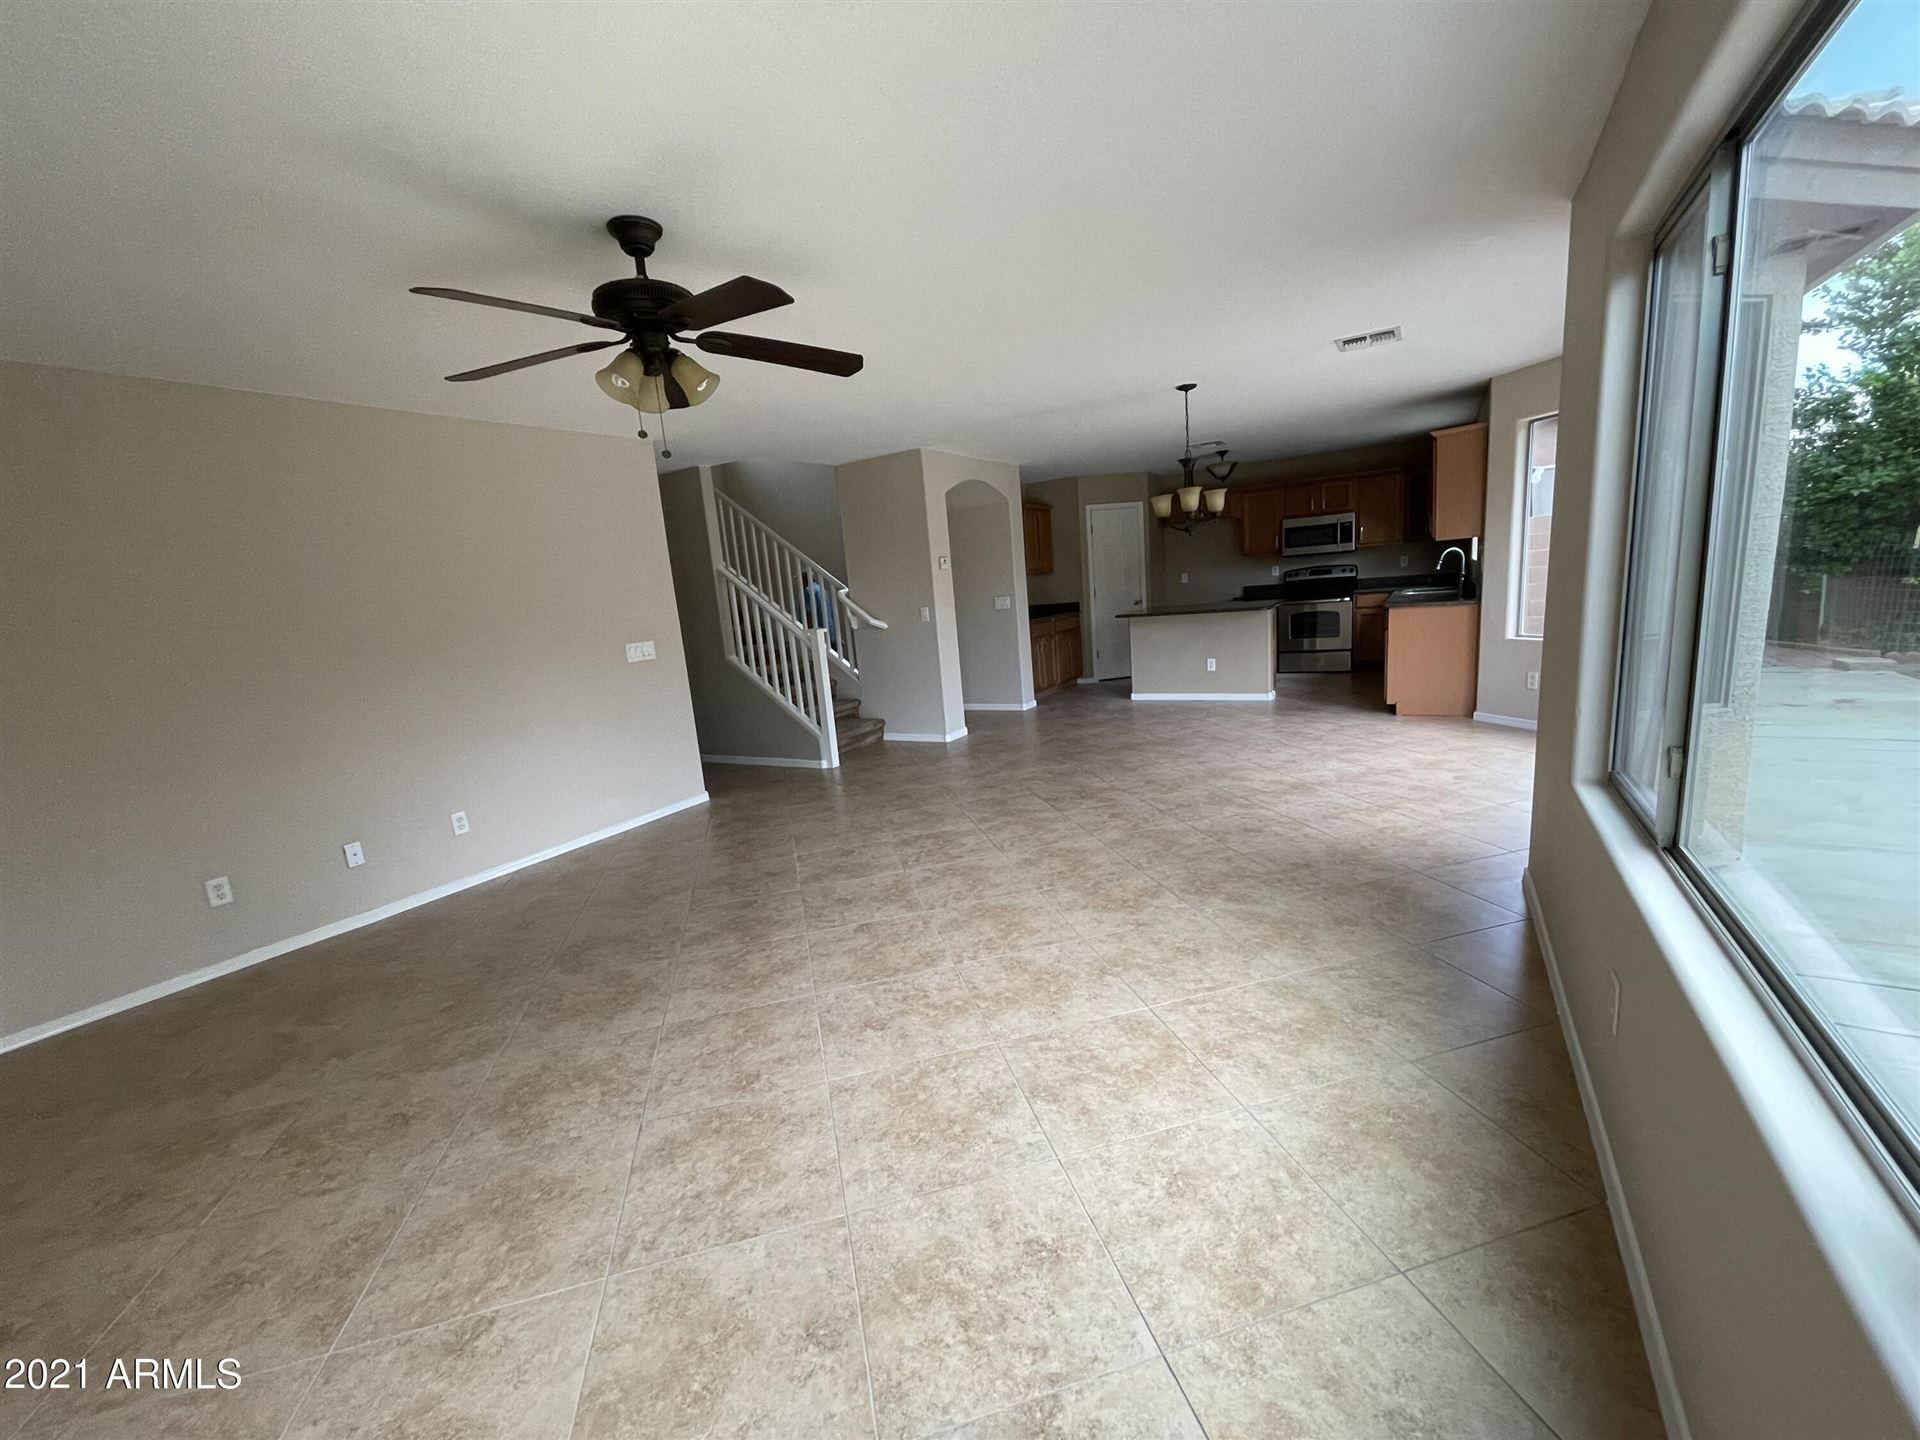 Photo of 8814 W MAGNOLIA Street, Tolleson, AZ 85353 (MLS # 6300574)